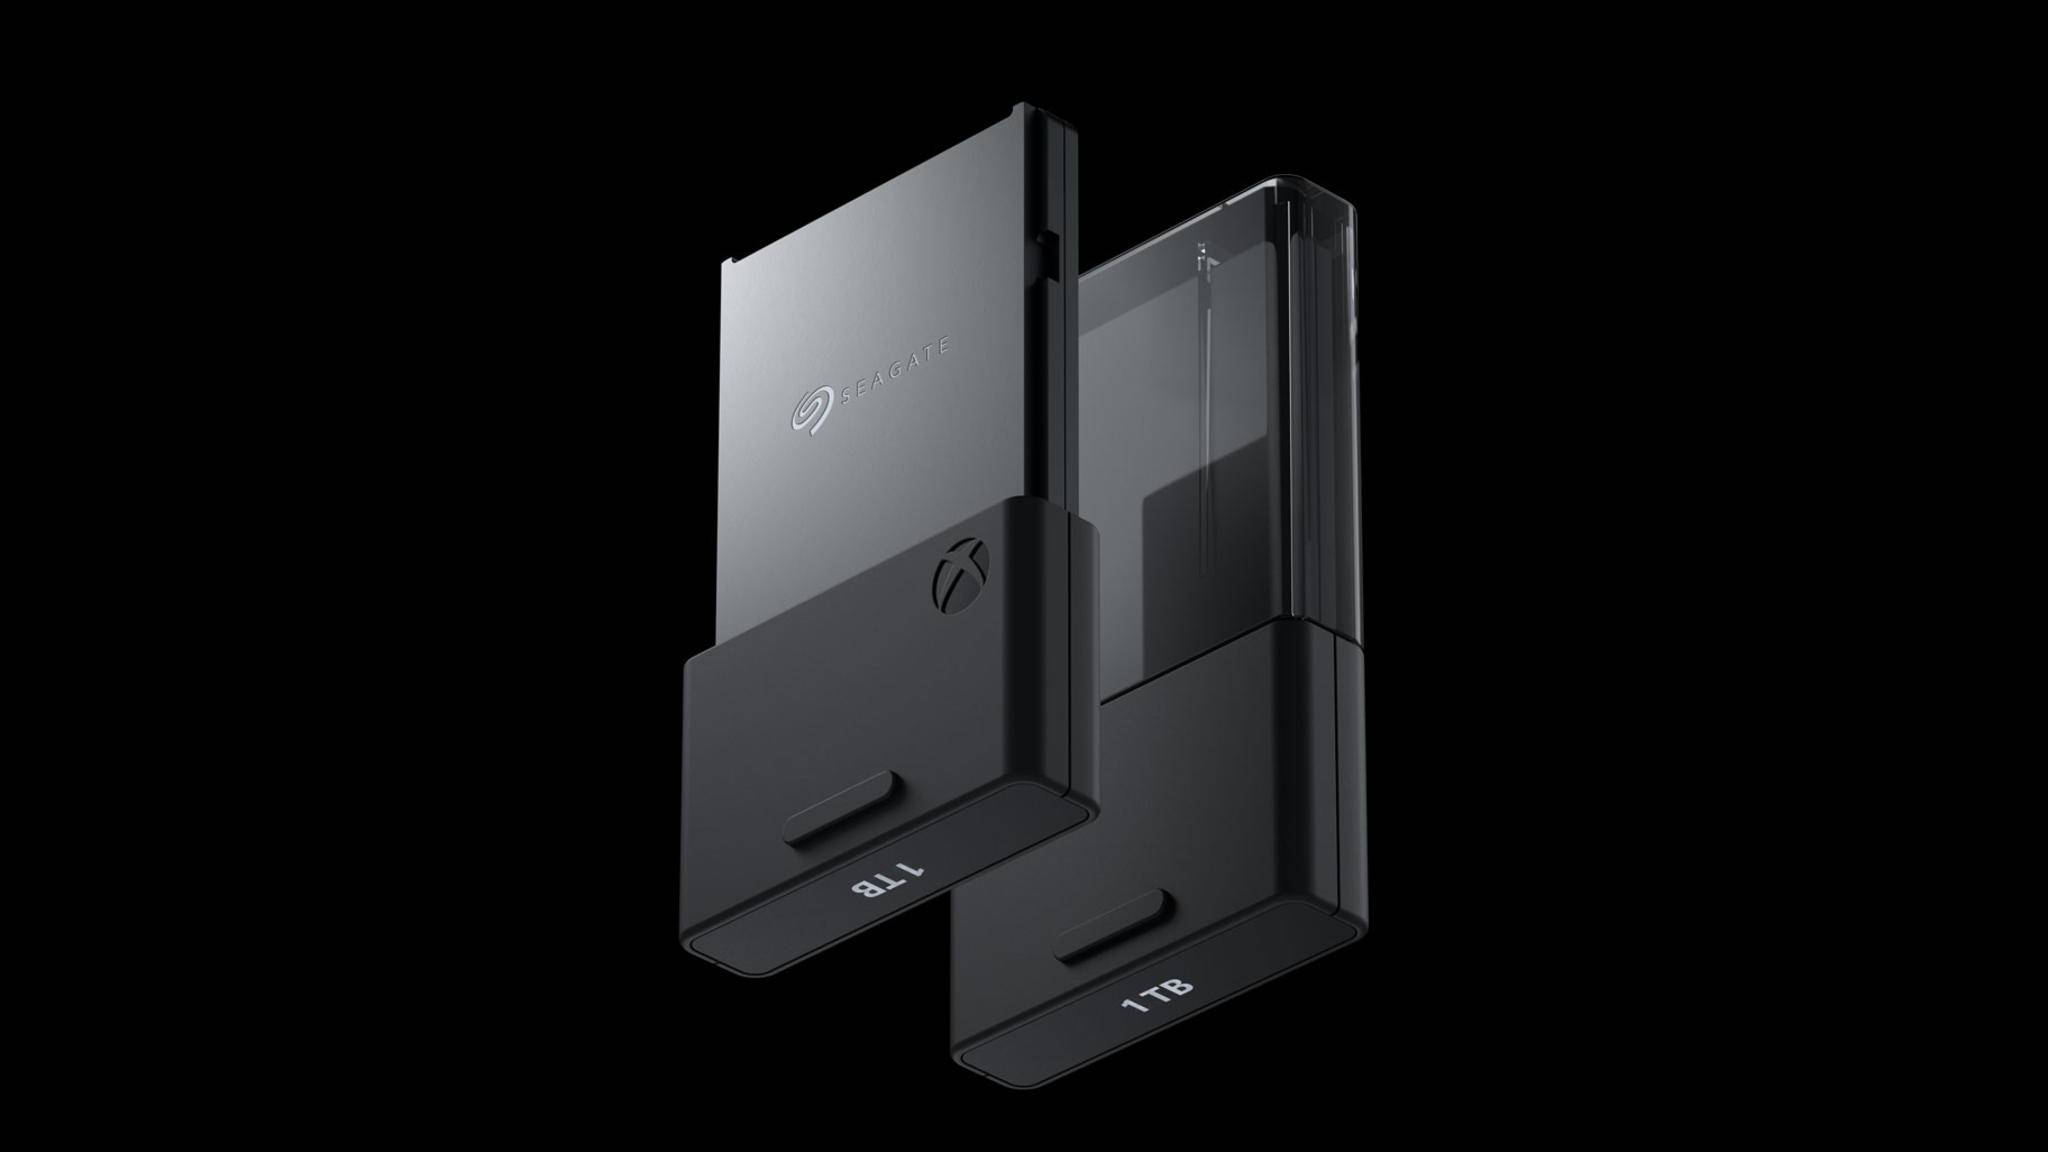 xbox-series-x-ssd-erweiterung-memory-card